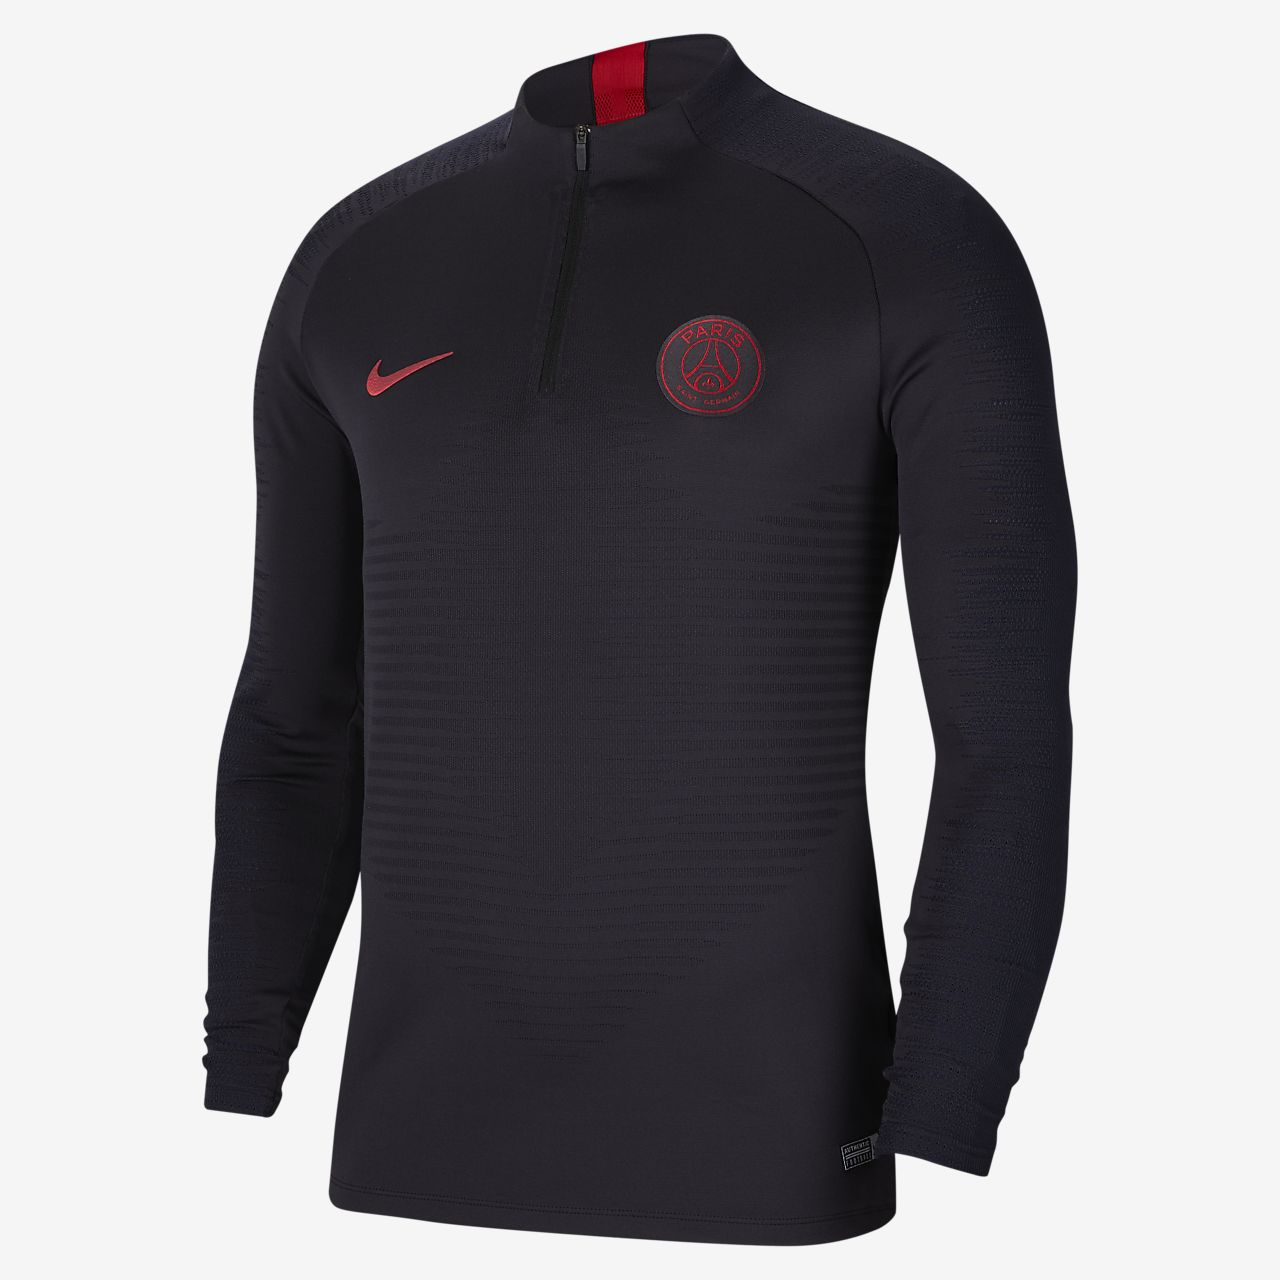 66f87ba9c ... Męska treningowa koszulka piłkarska Nike VaporKnit Paris Saint-Germain  Strike